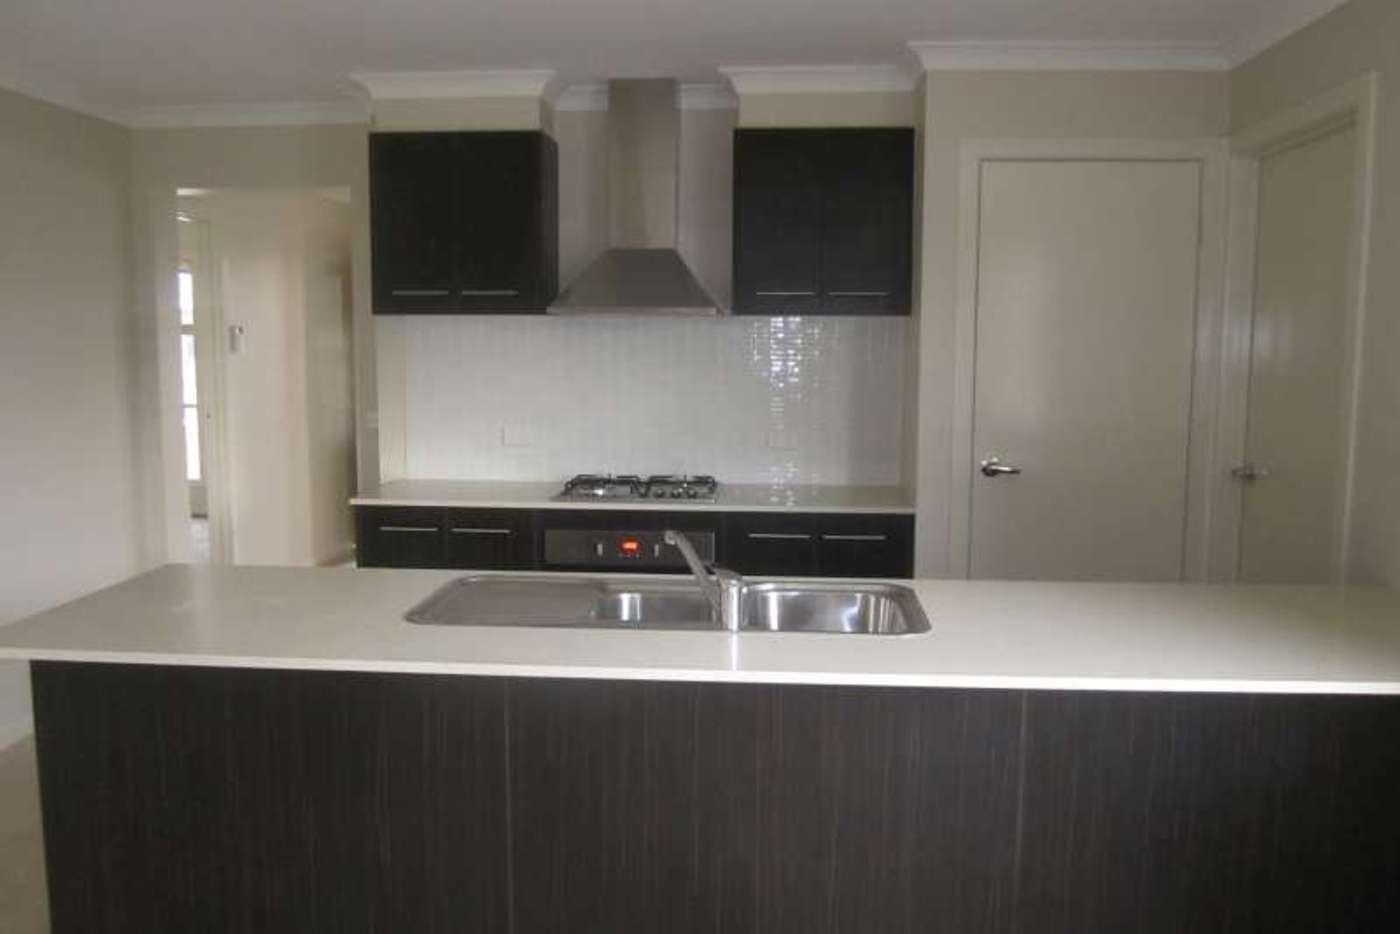 Main view of Homely house listing, 5 Narmara Mews, Wyndham Vale VIC 3024